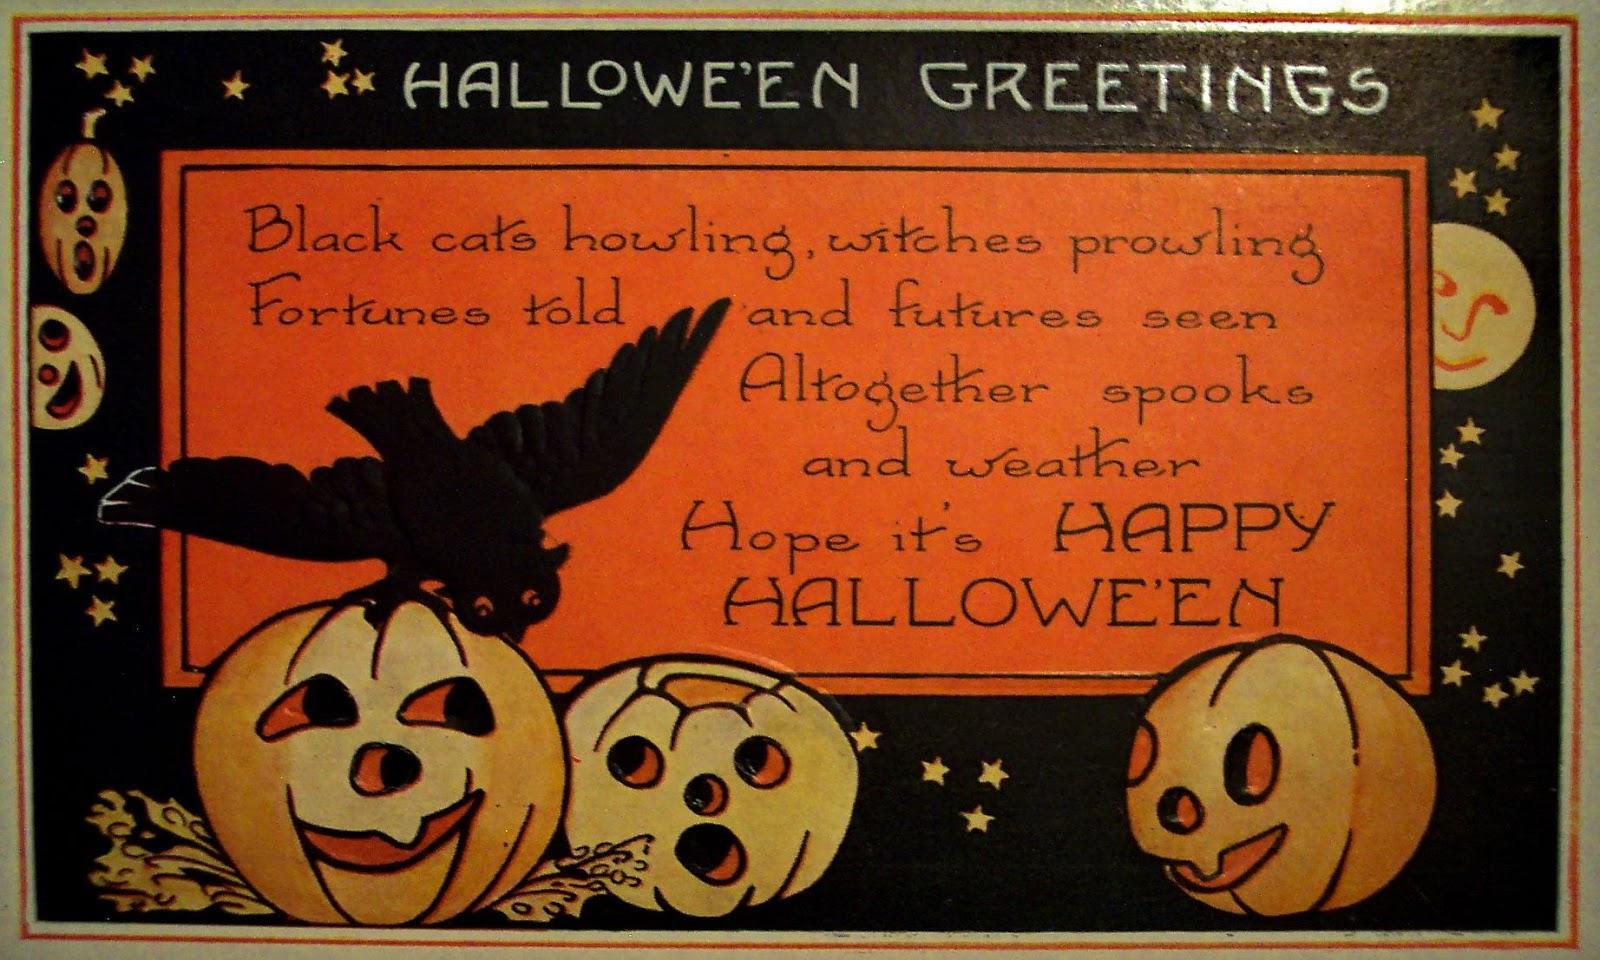 Halloween card greetings